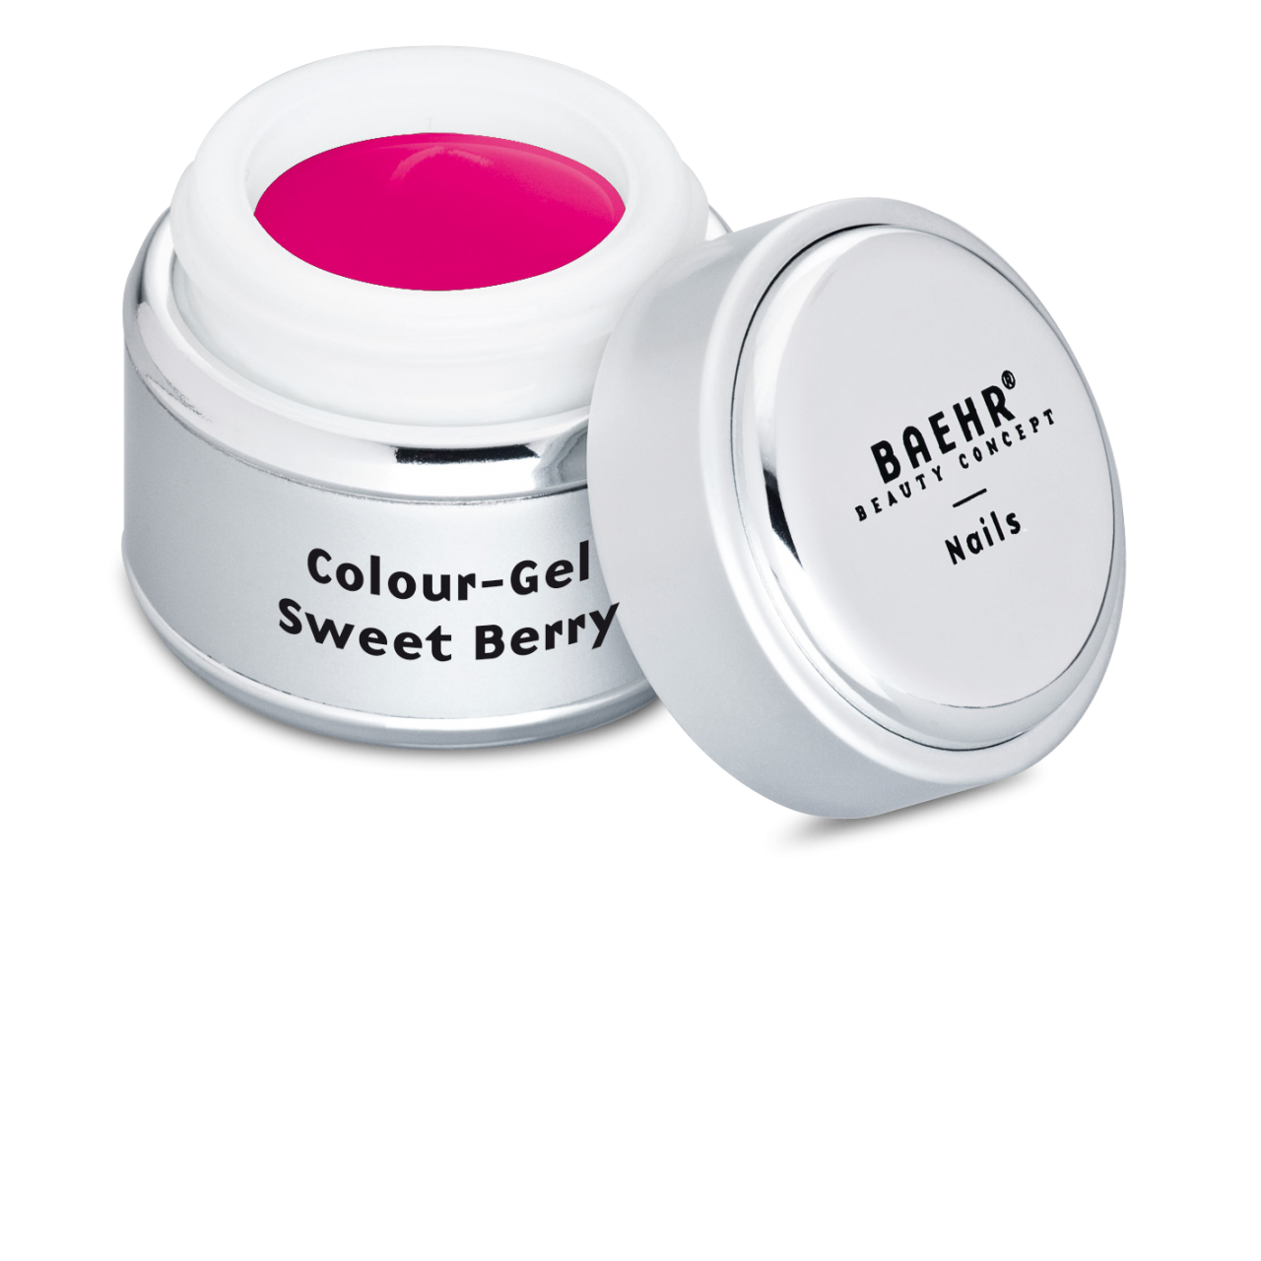 Colour-Gel Sweet Berry 5 ml